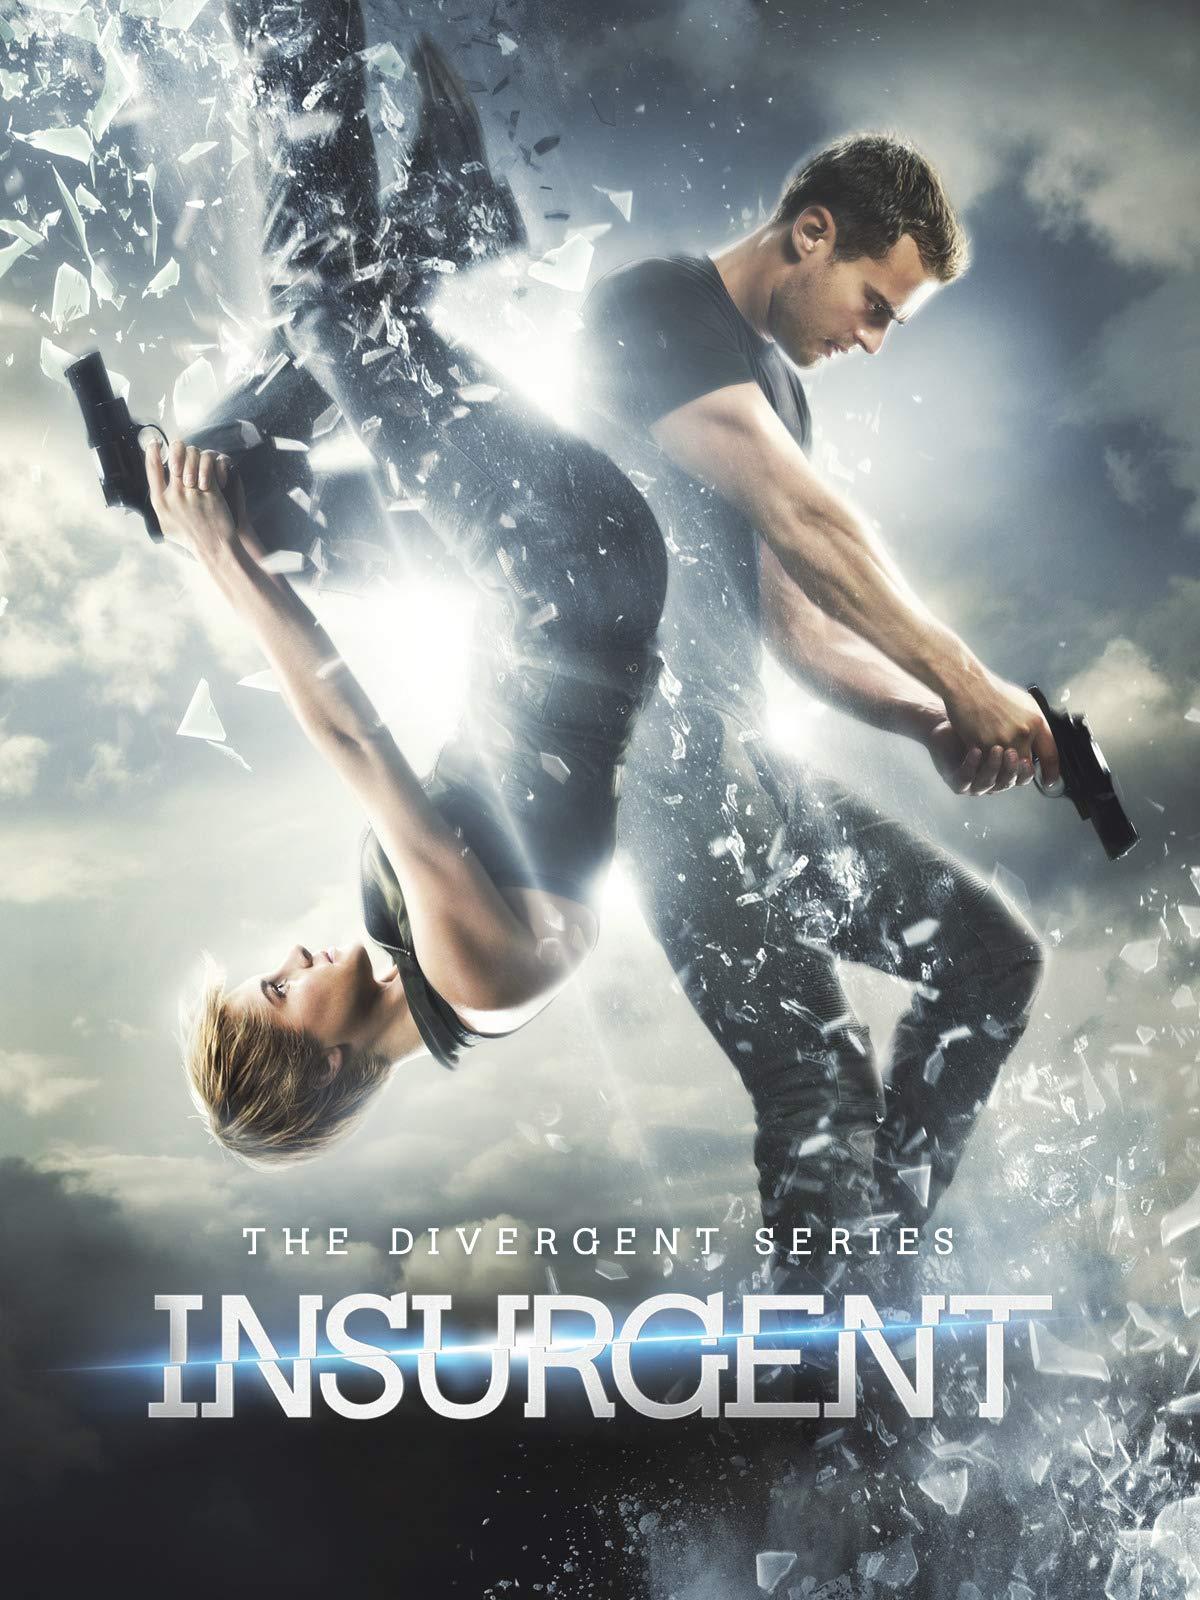 Watch The Divergent Series Insurgent Prime Video